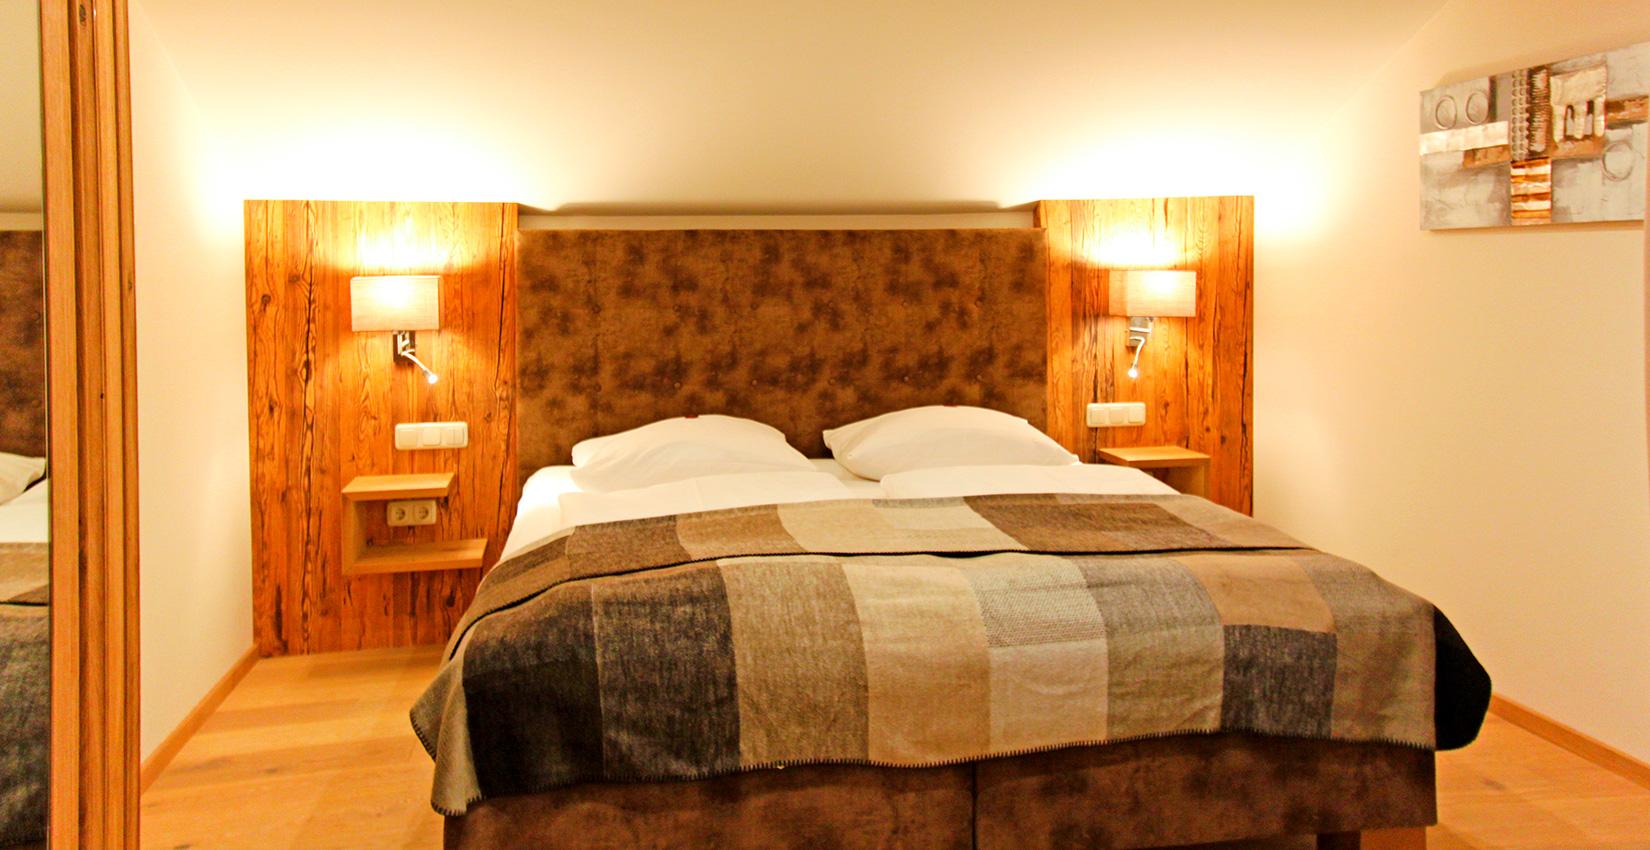 Ferienappartements Bergknappenhof Kategorie 12 Schlafzimmer